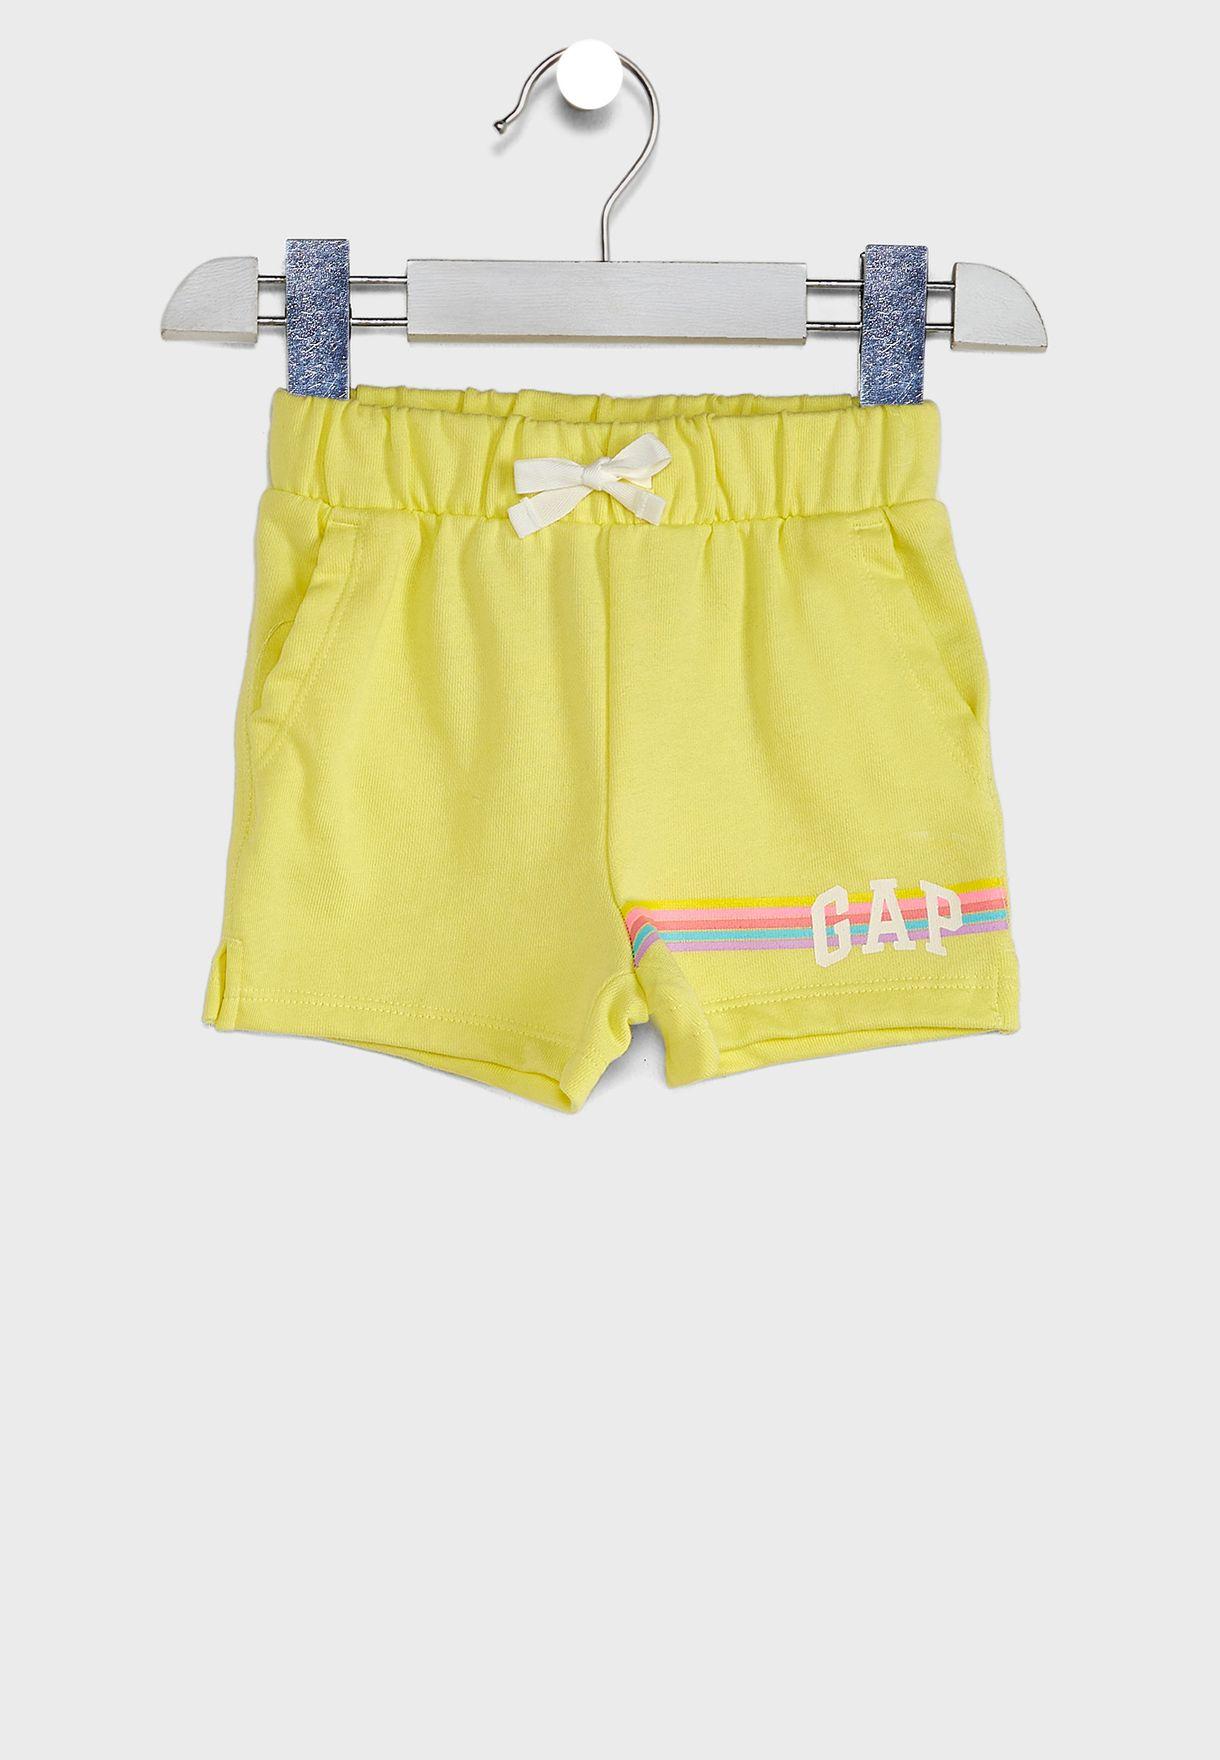 Kids Tie Dye Shorts